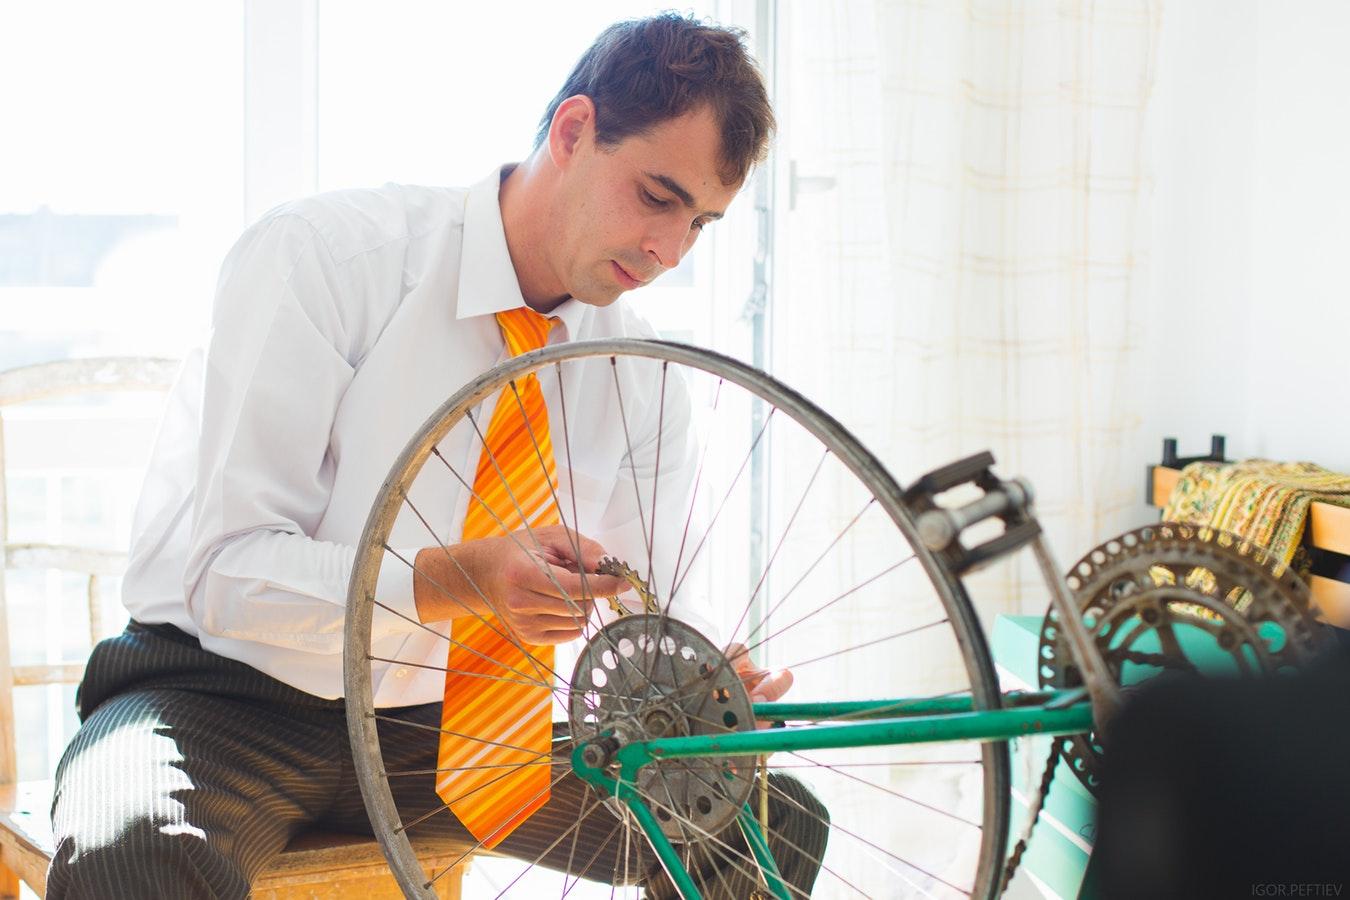 fixing a bike